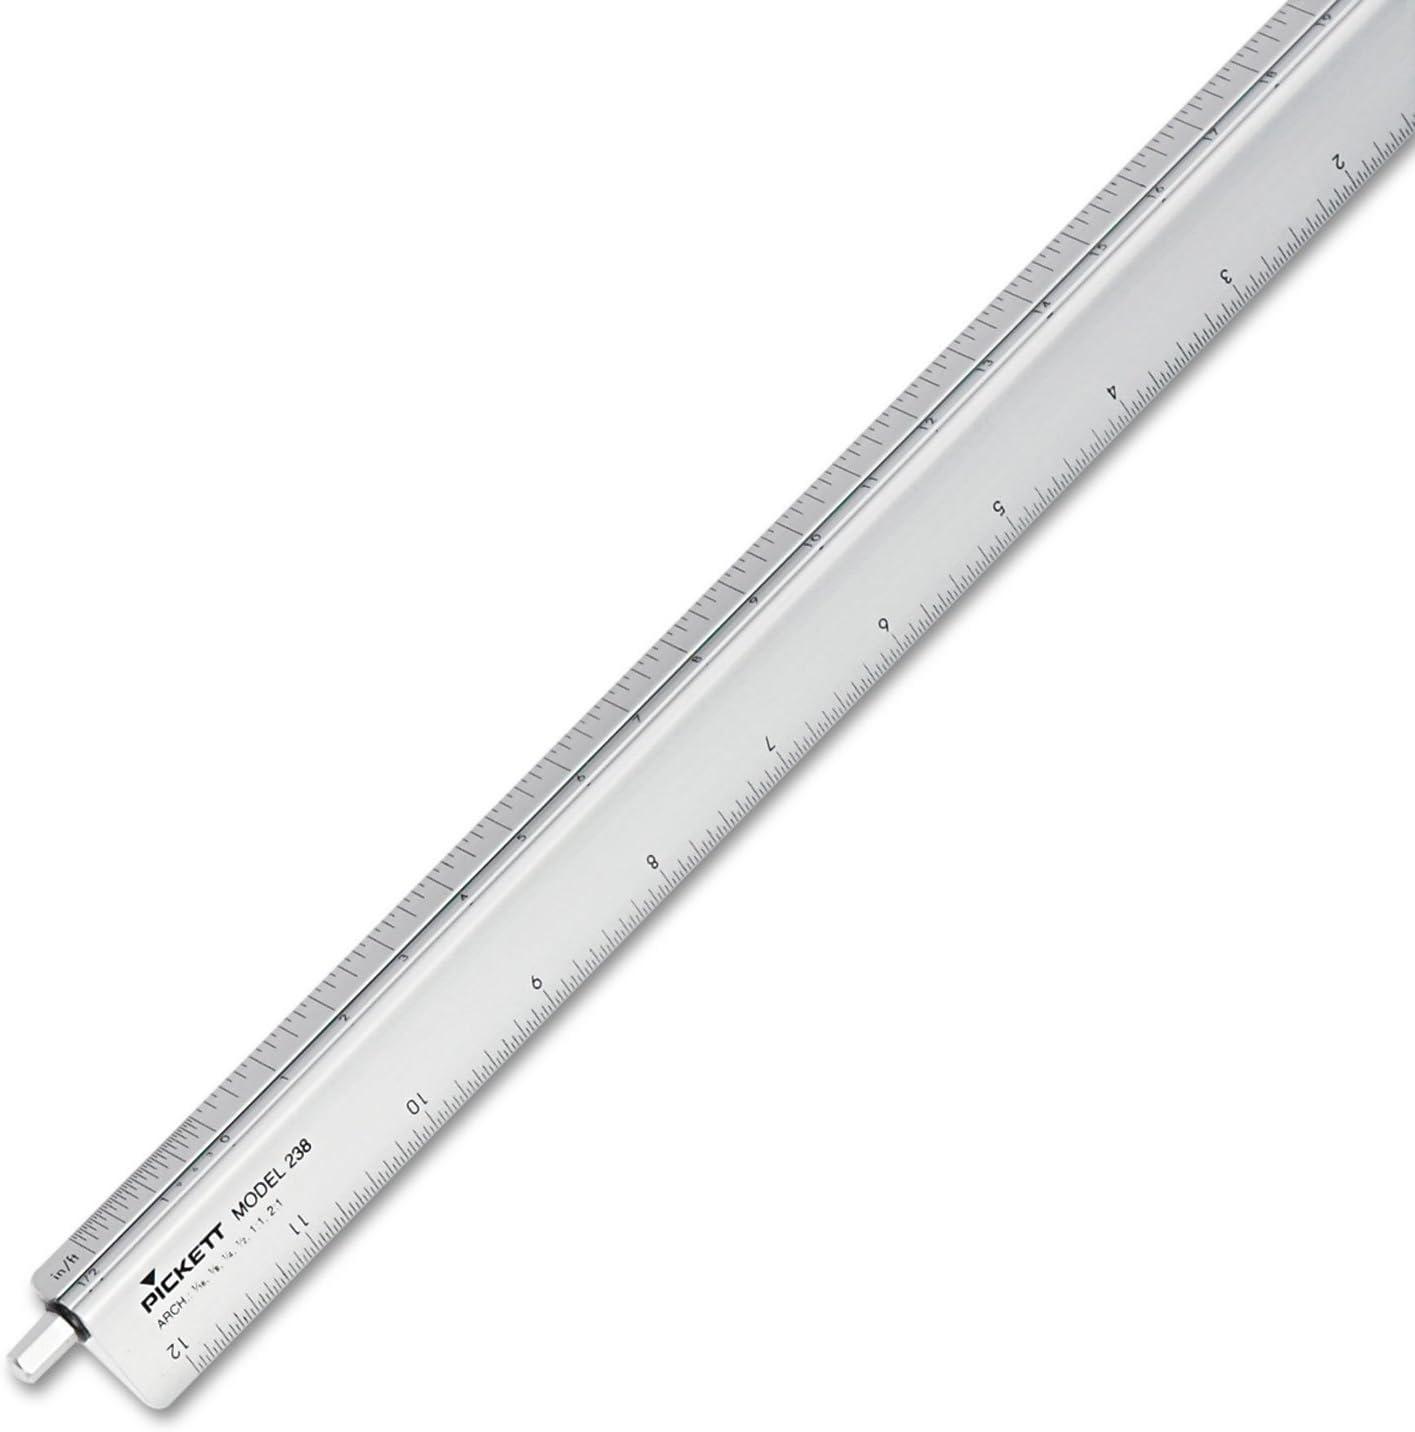 CHA238 Adjustable Triangular Scale Aluminum Architects Ruler